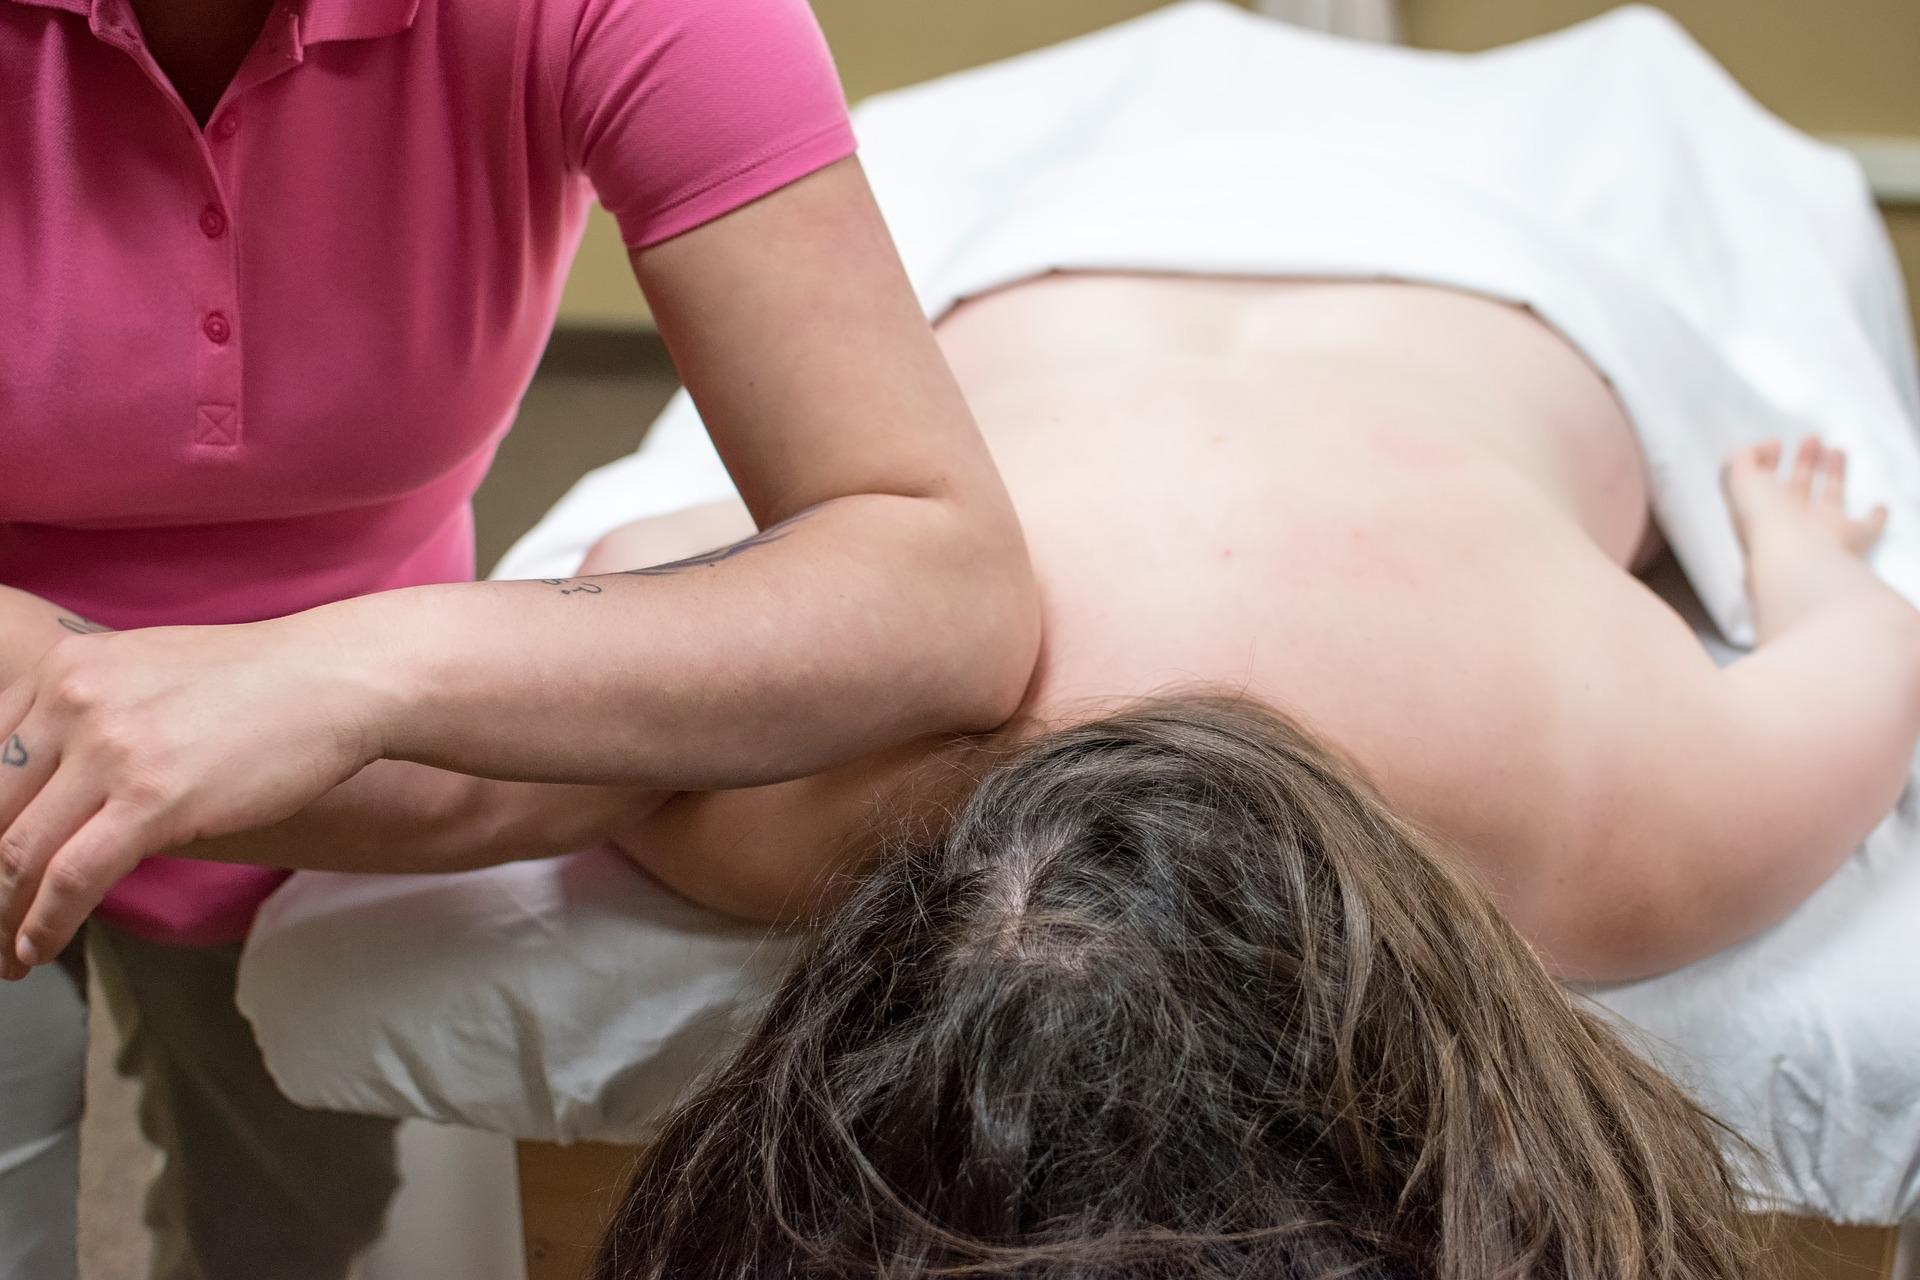 massage-2333201_1920.jpg